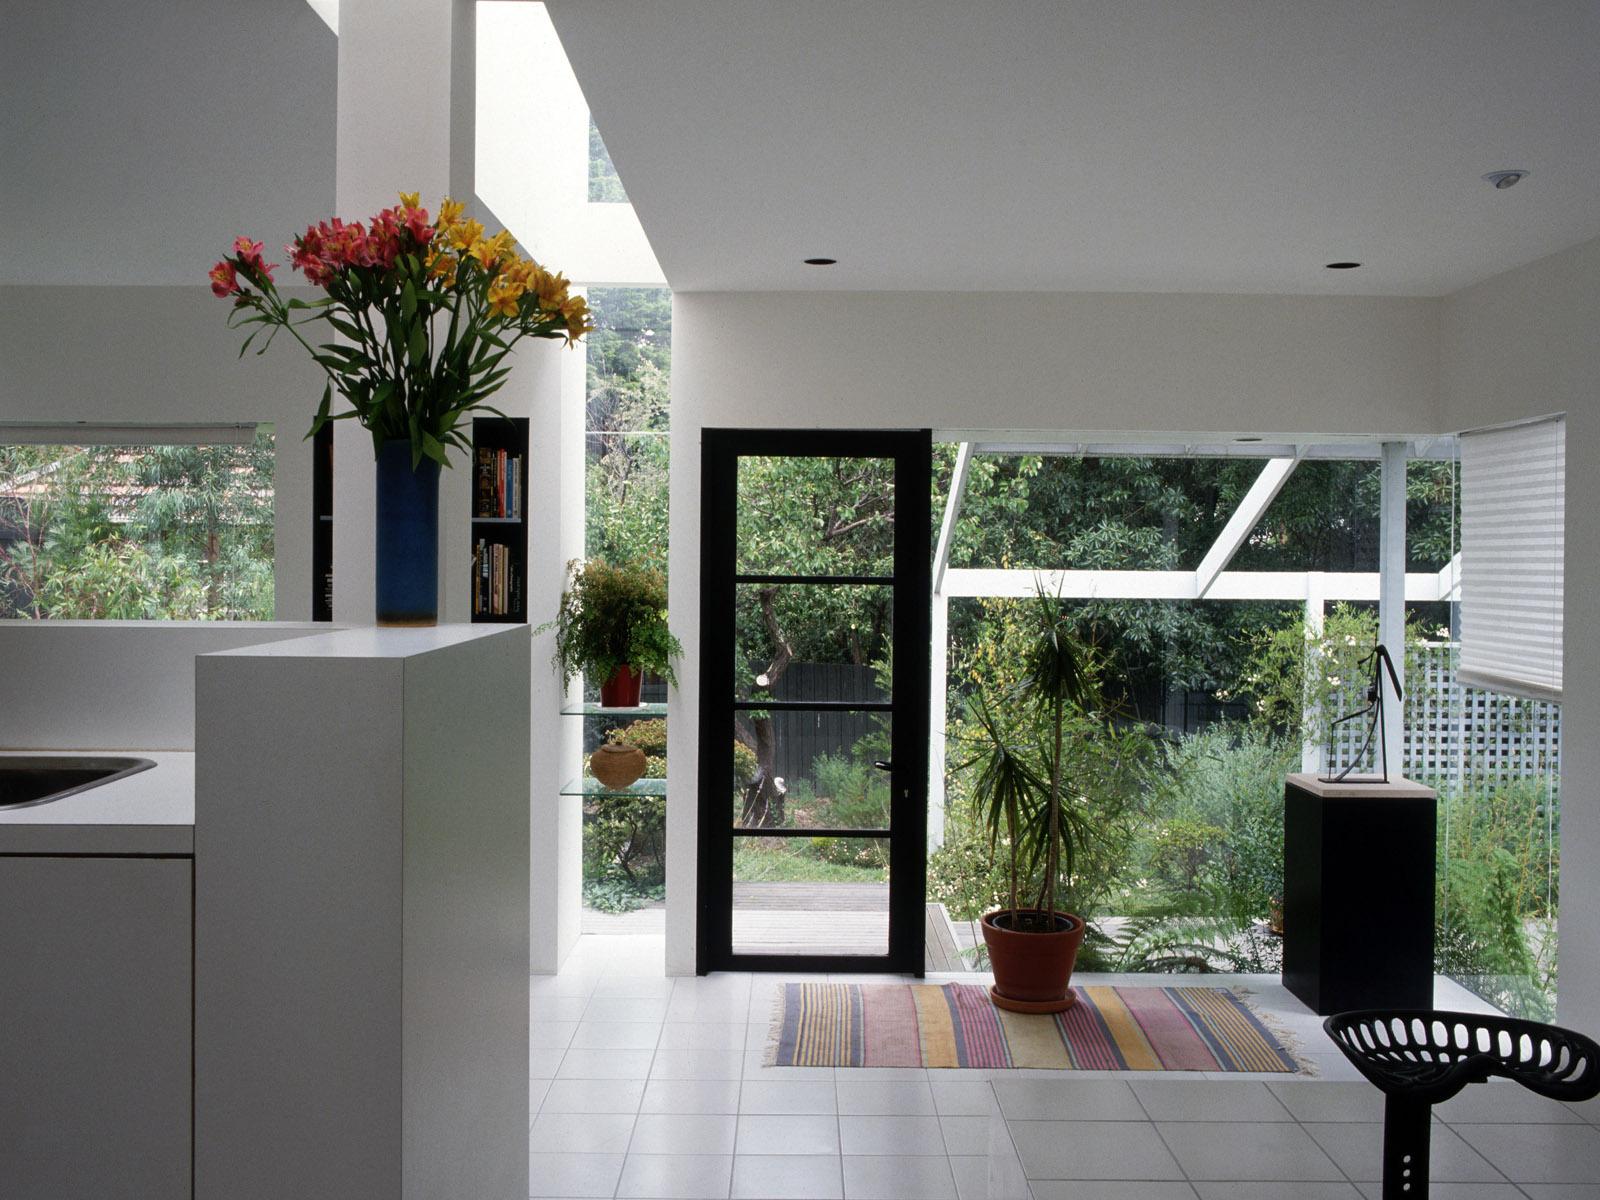 Garden-View-From-Inside Garden View From Inside